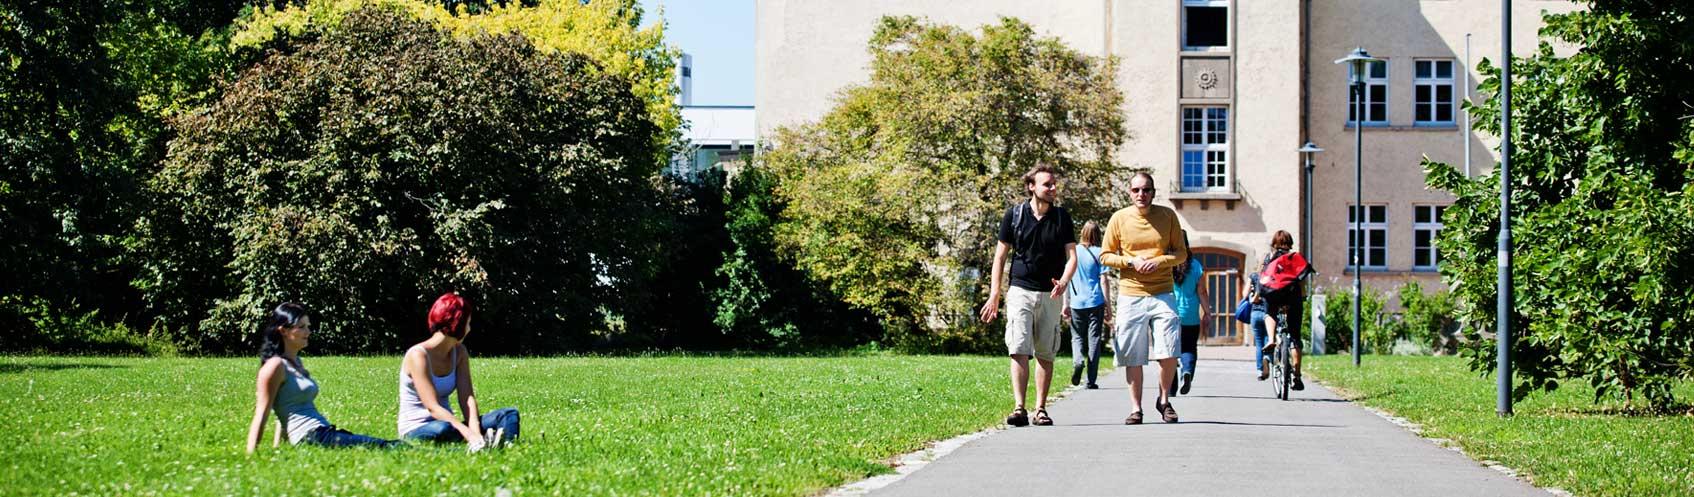 Fachhochschule Erfurt